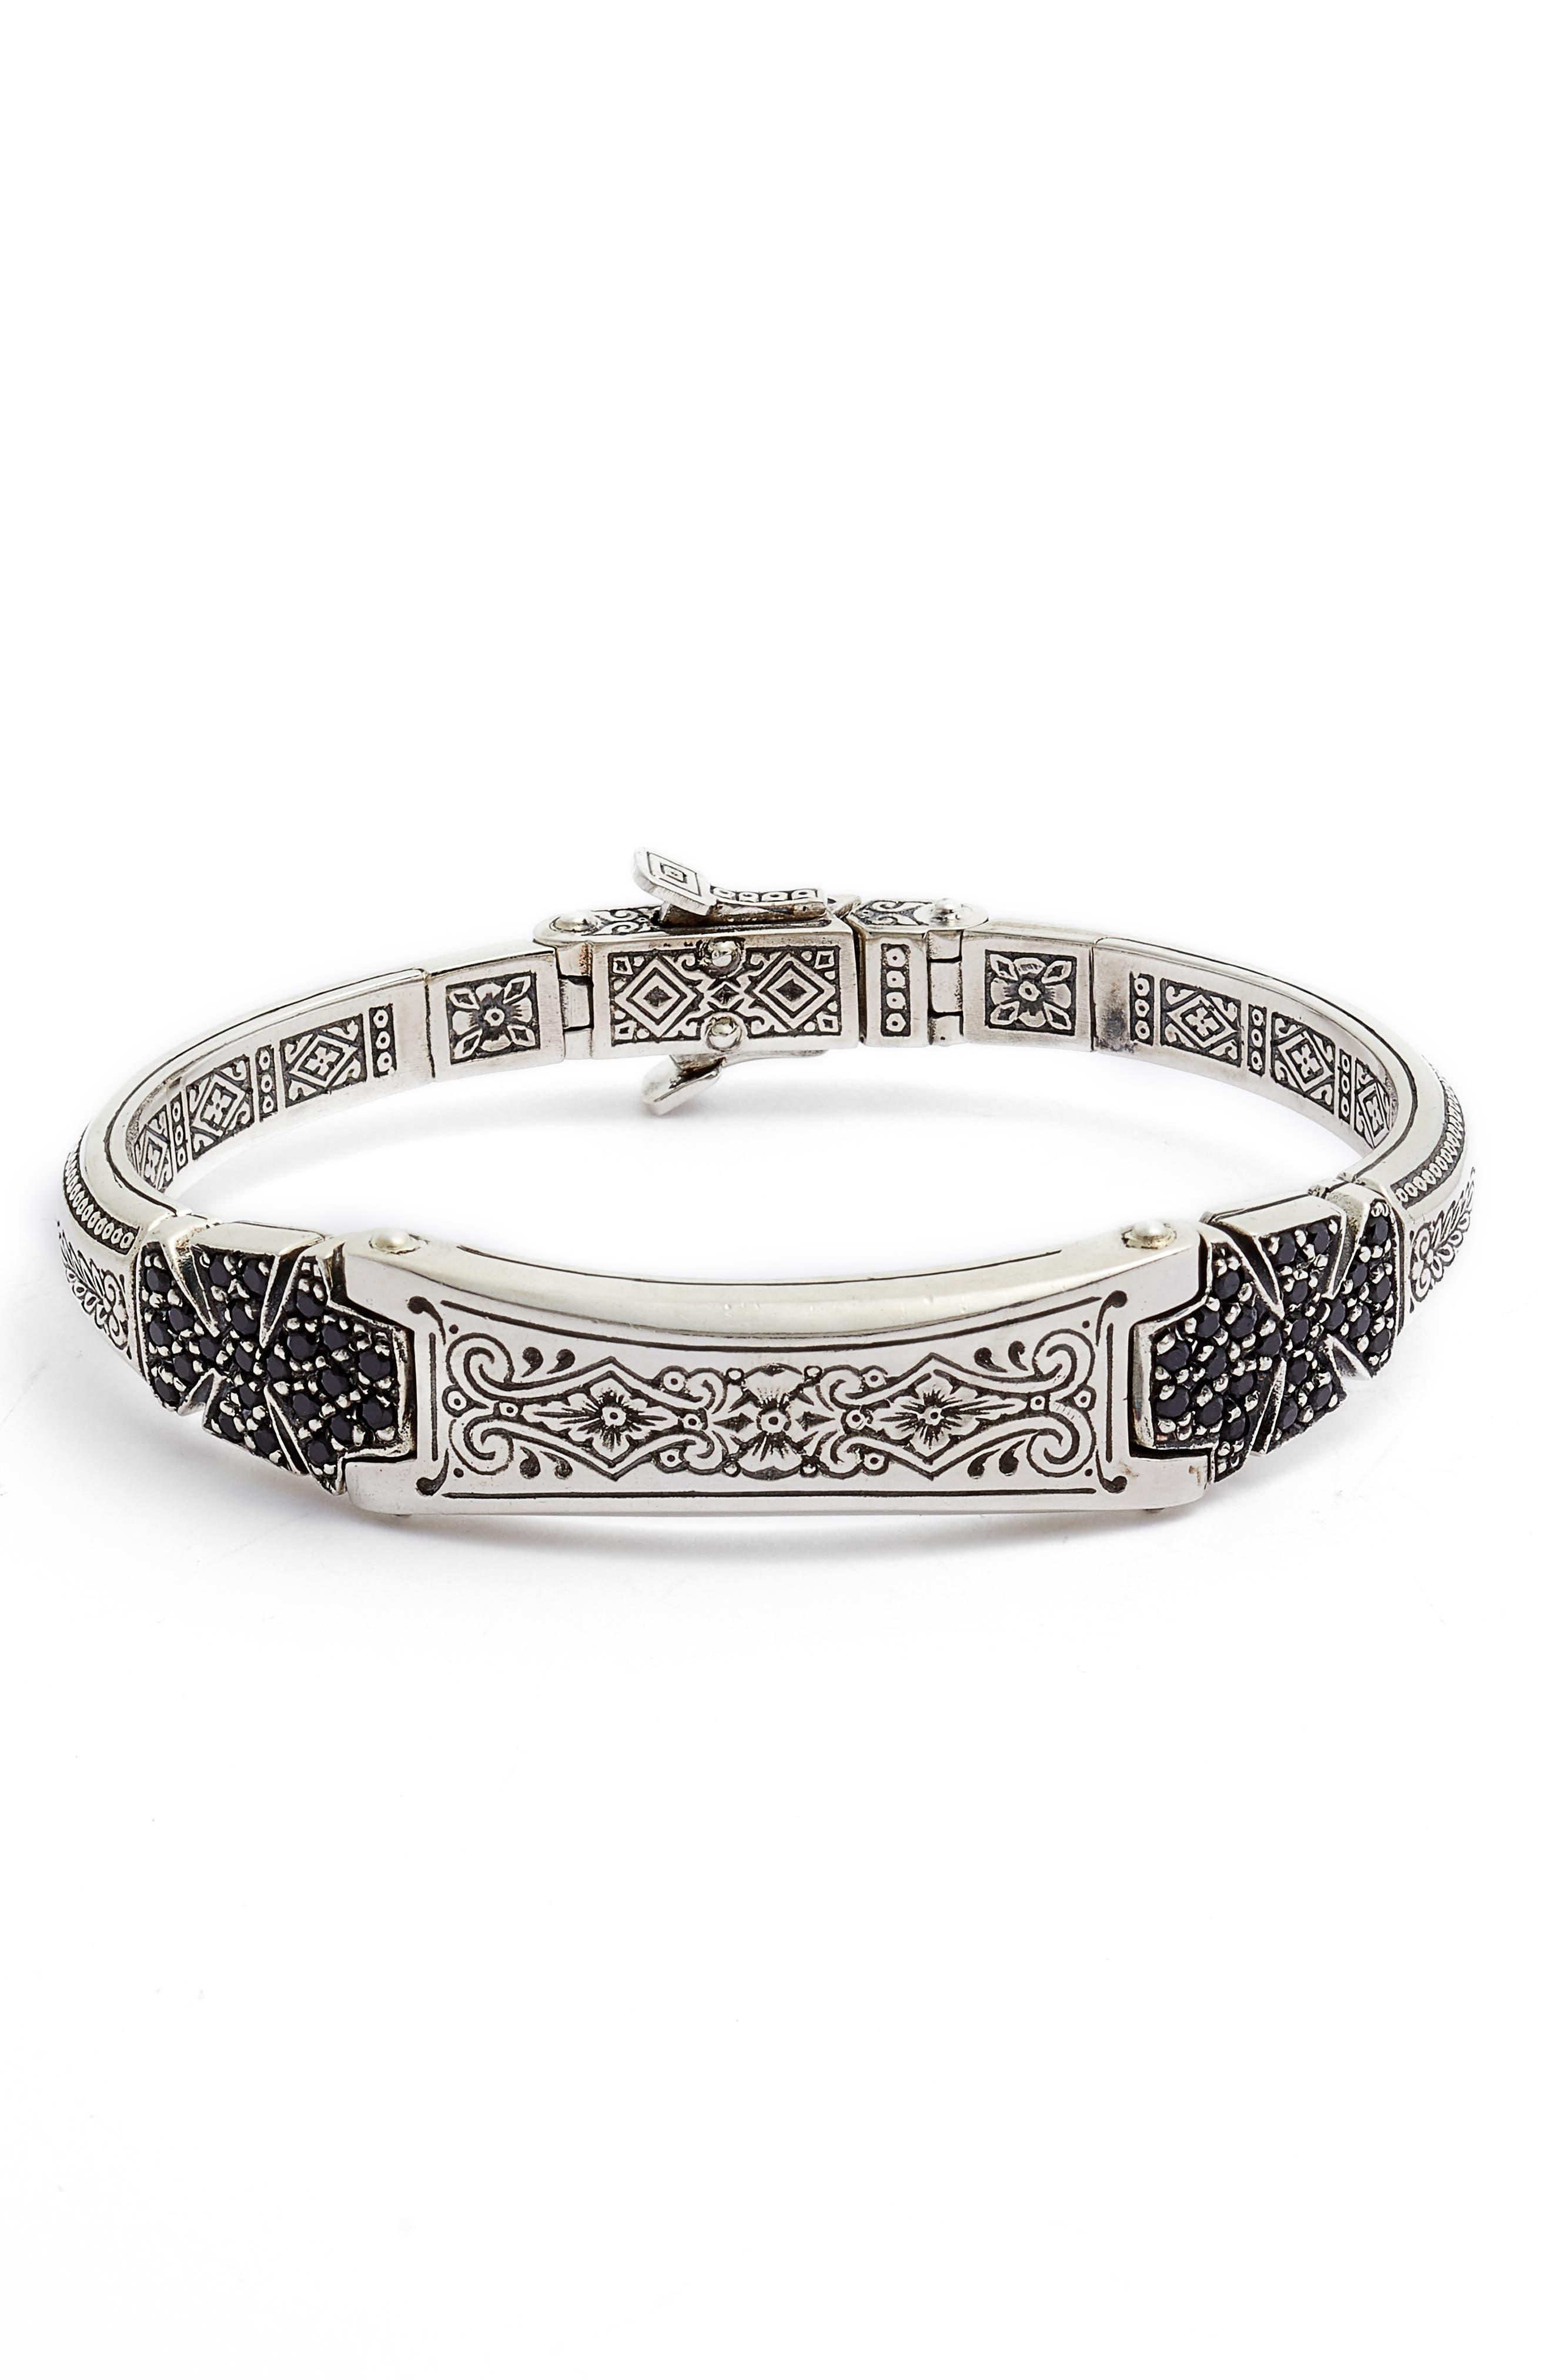 Konstantino Double Stavros Spinel Cross Cuff Bracelet